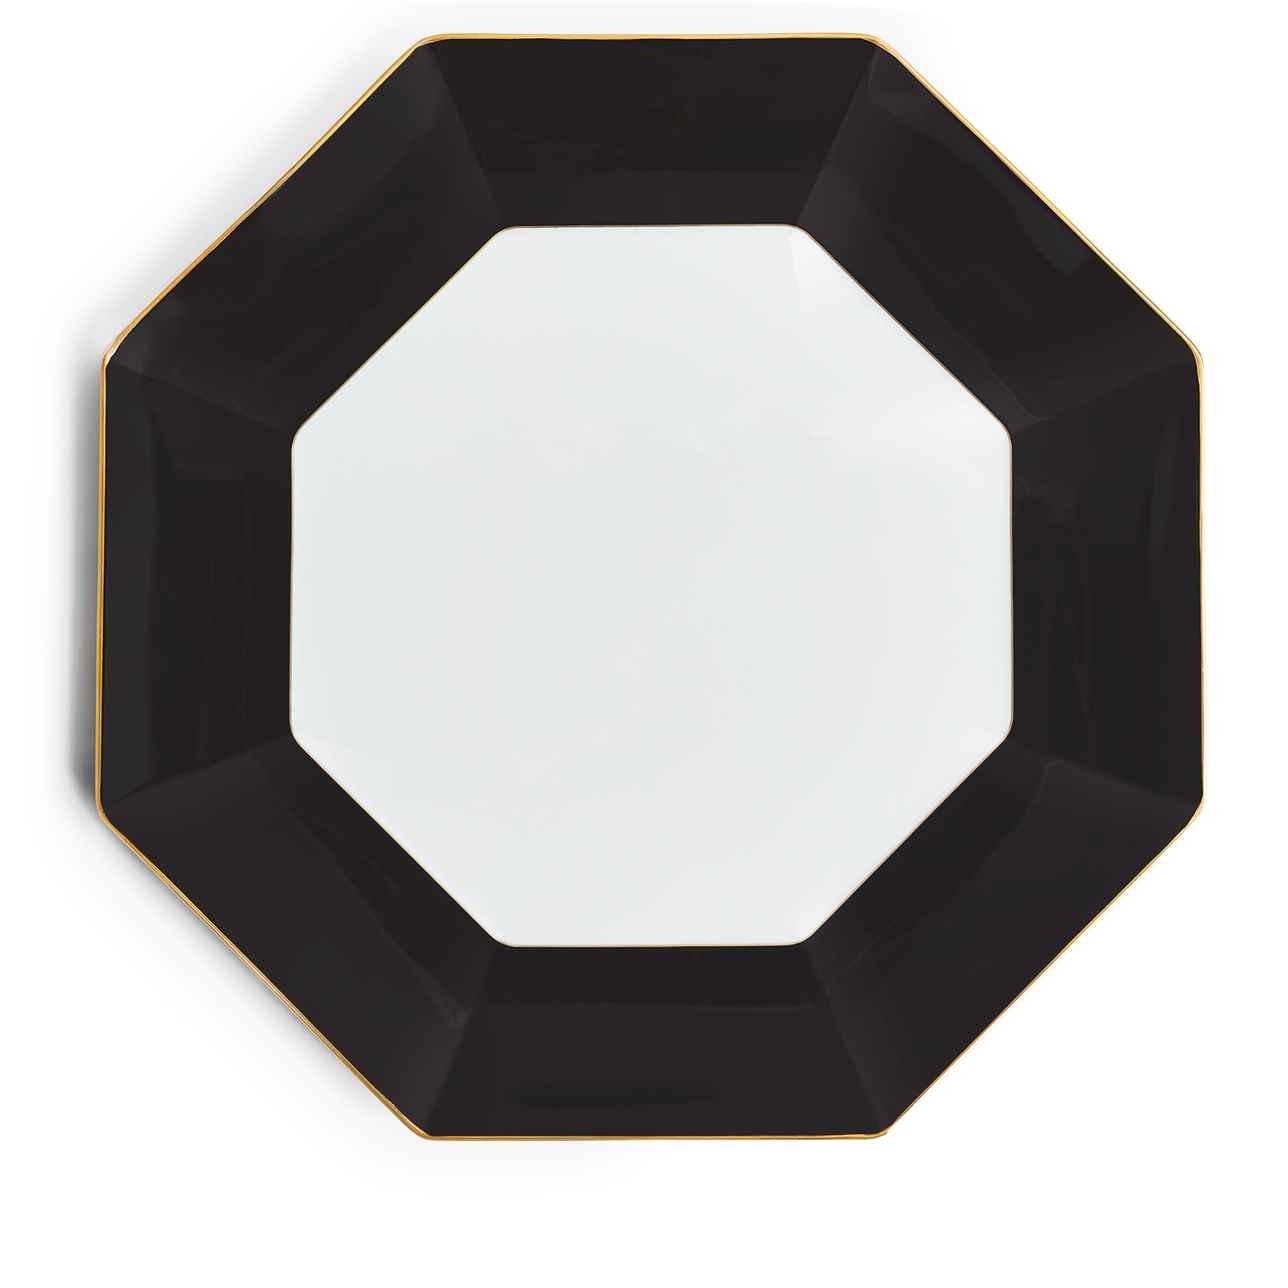 Arris Octagonal Charger Plate 33cm